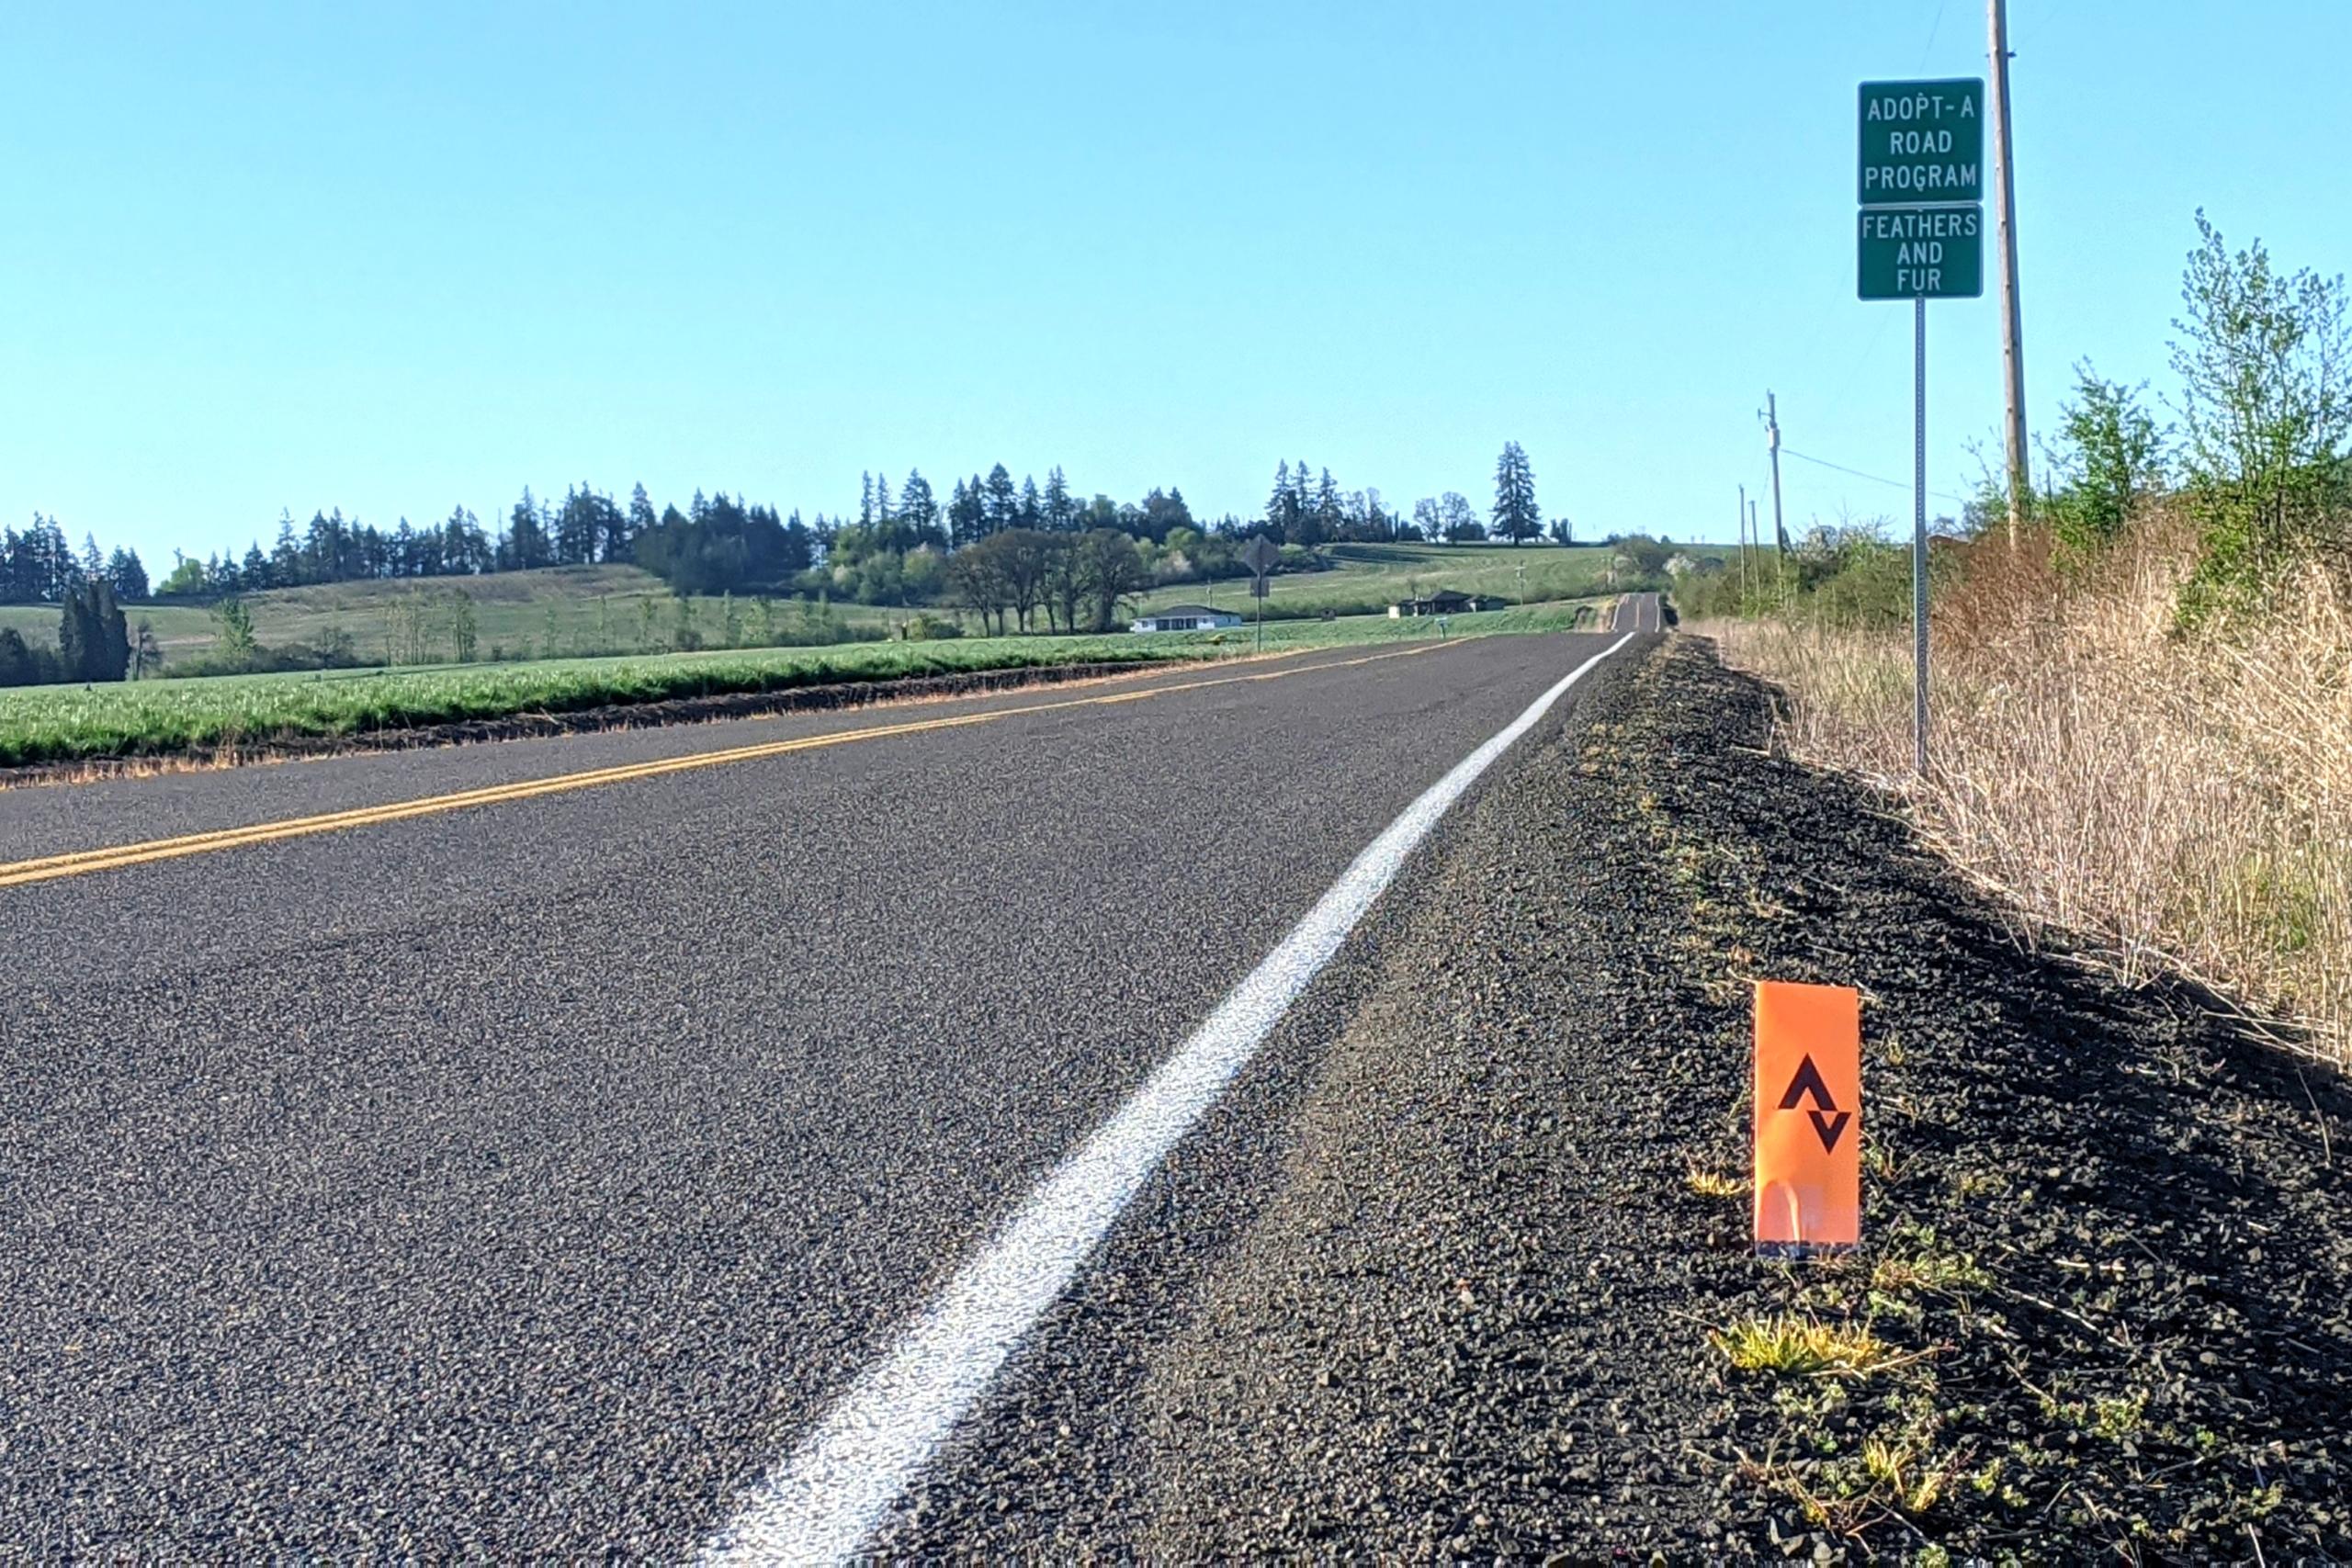 Srava marker along a paved road